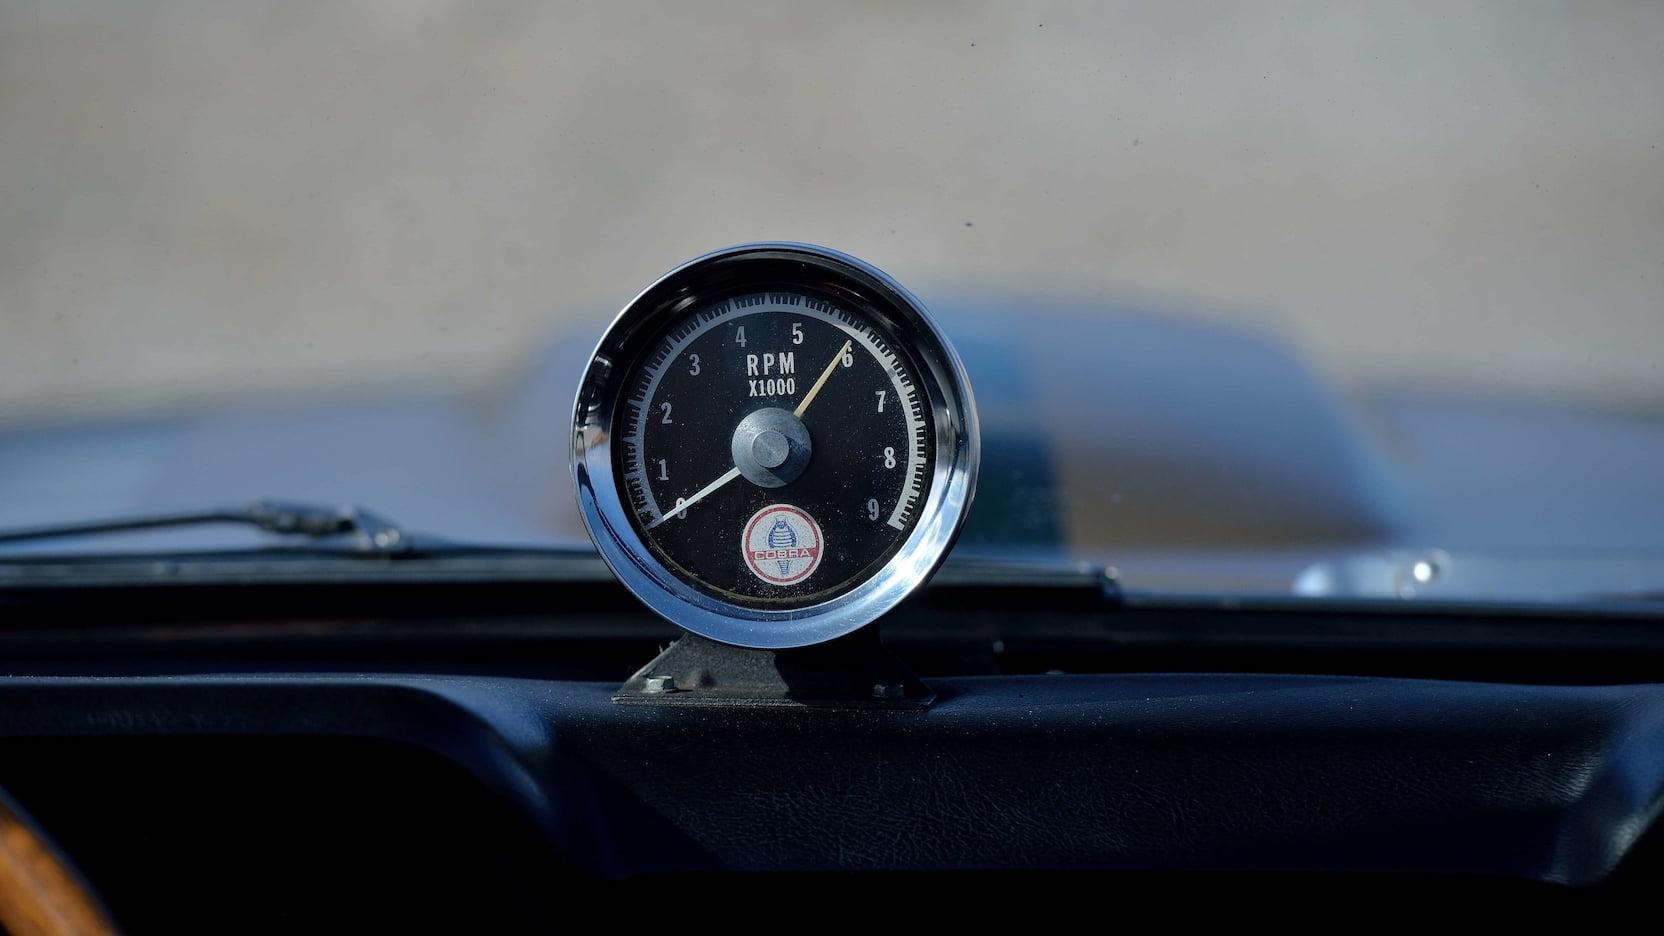 1966 Shelby GT350 Convertible RPM Gauge